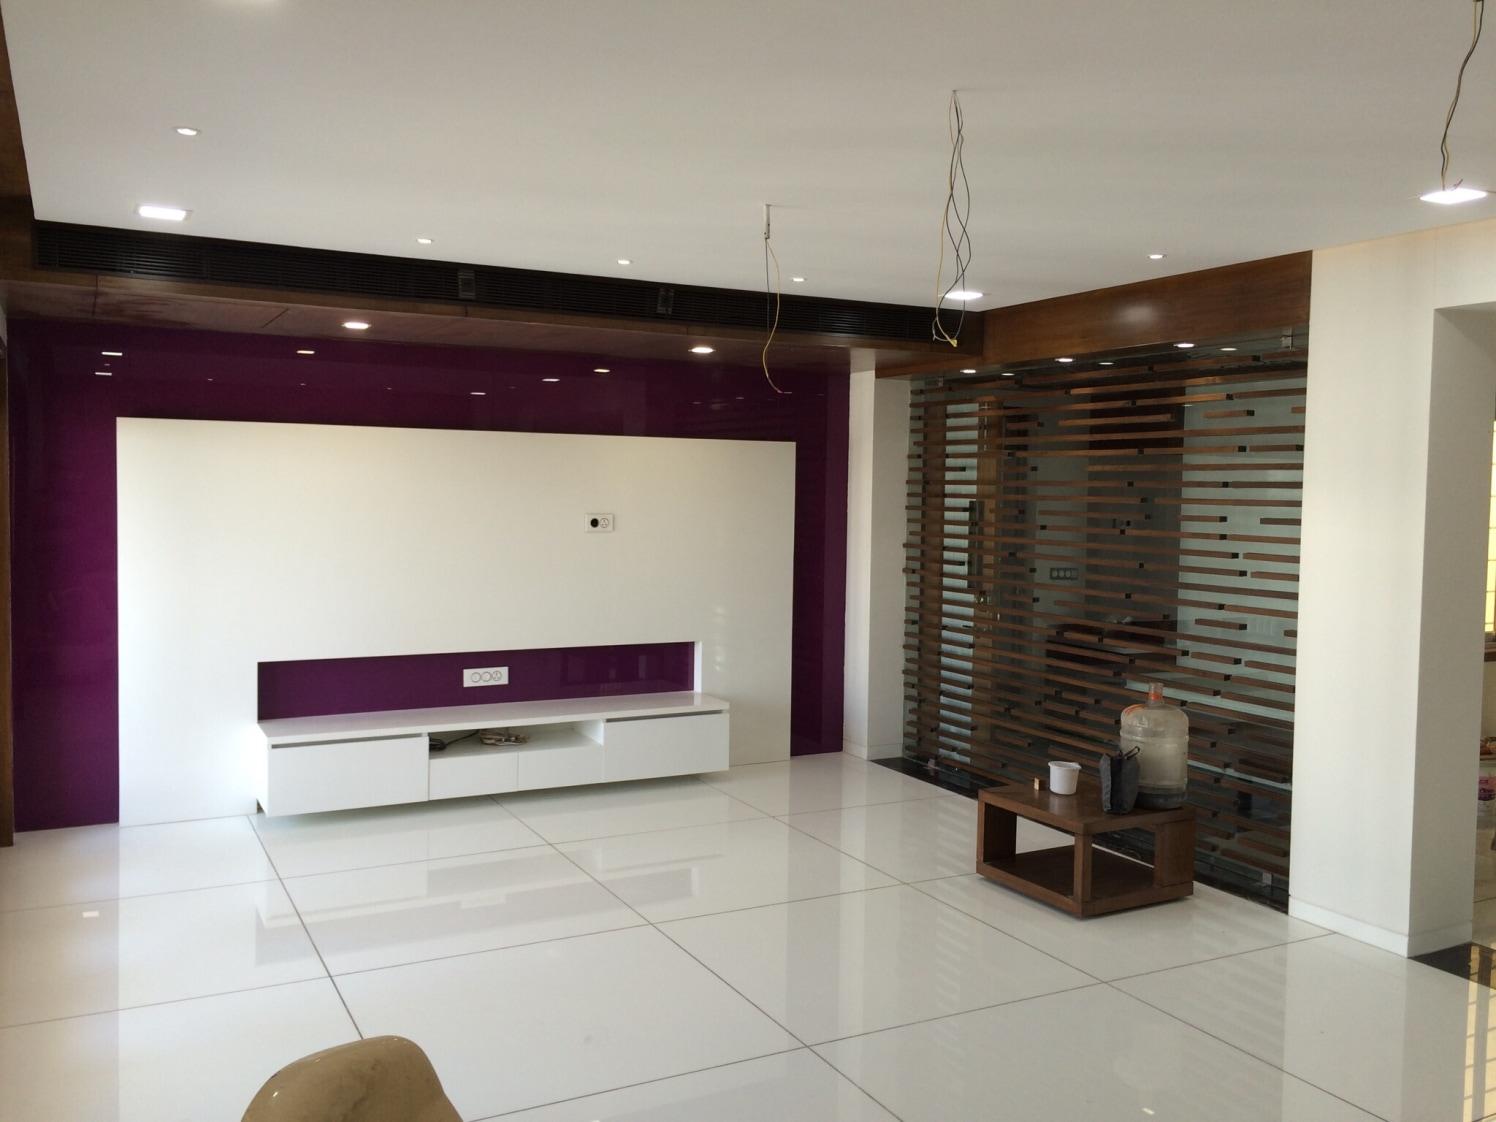 Sleek Fininsh by Vatsal Hadvani Living-room Minimalistic | Interior Design Photos & Ideas